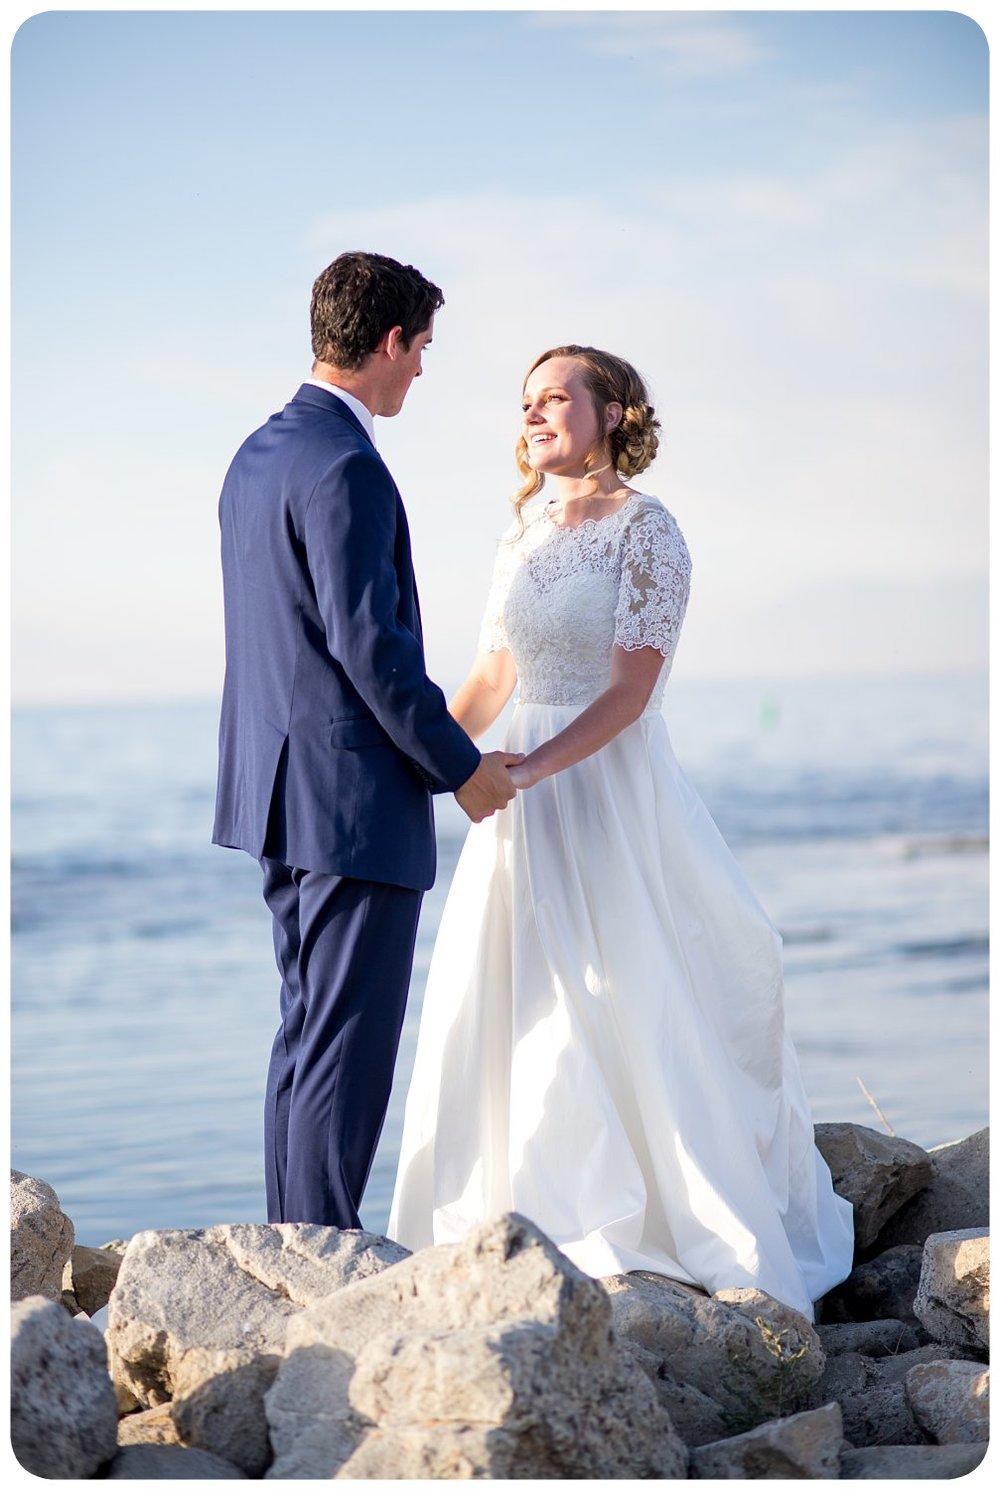 Rachel Lindsey Photography | Salt Lake City Utah | Wedding Photographer | Salt Lake Marina